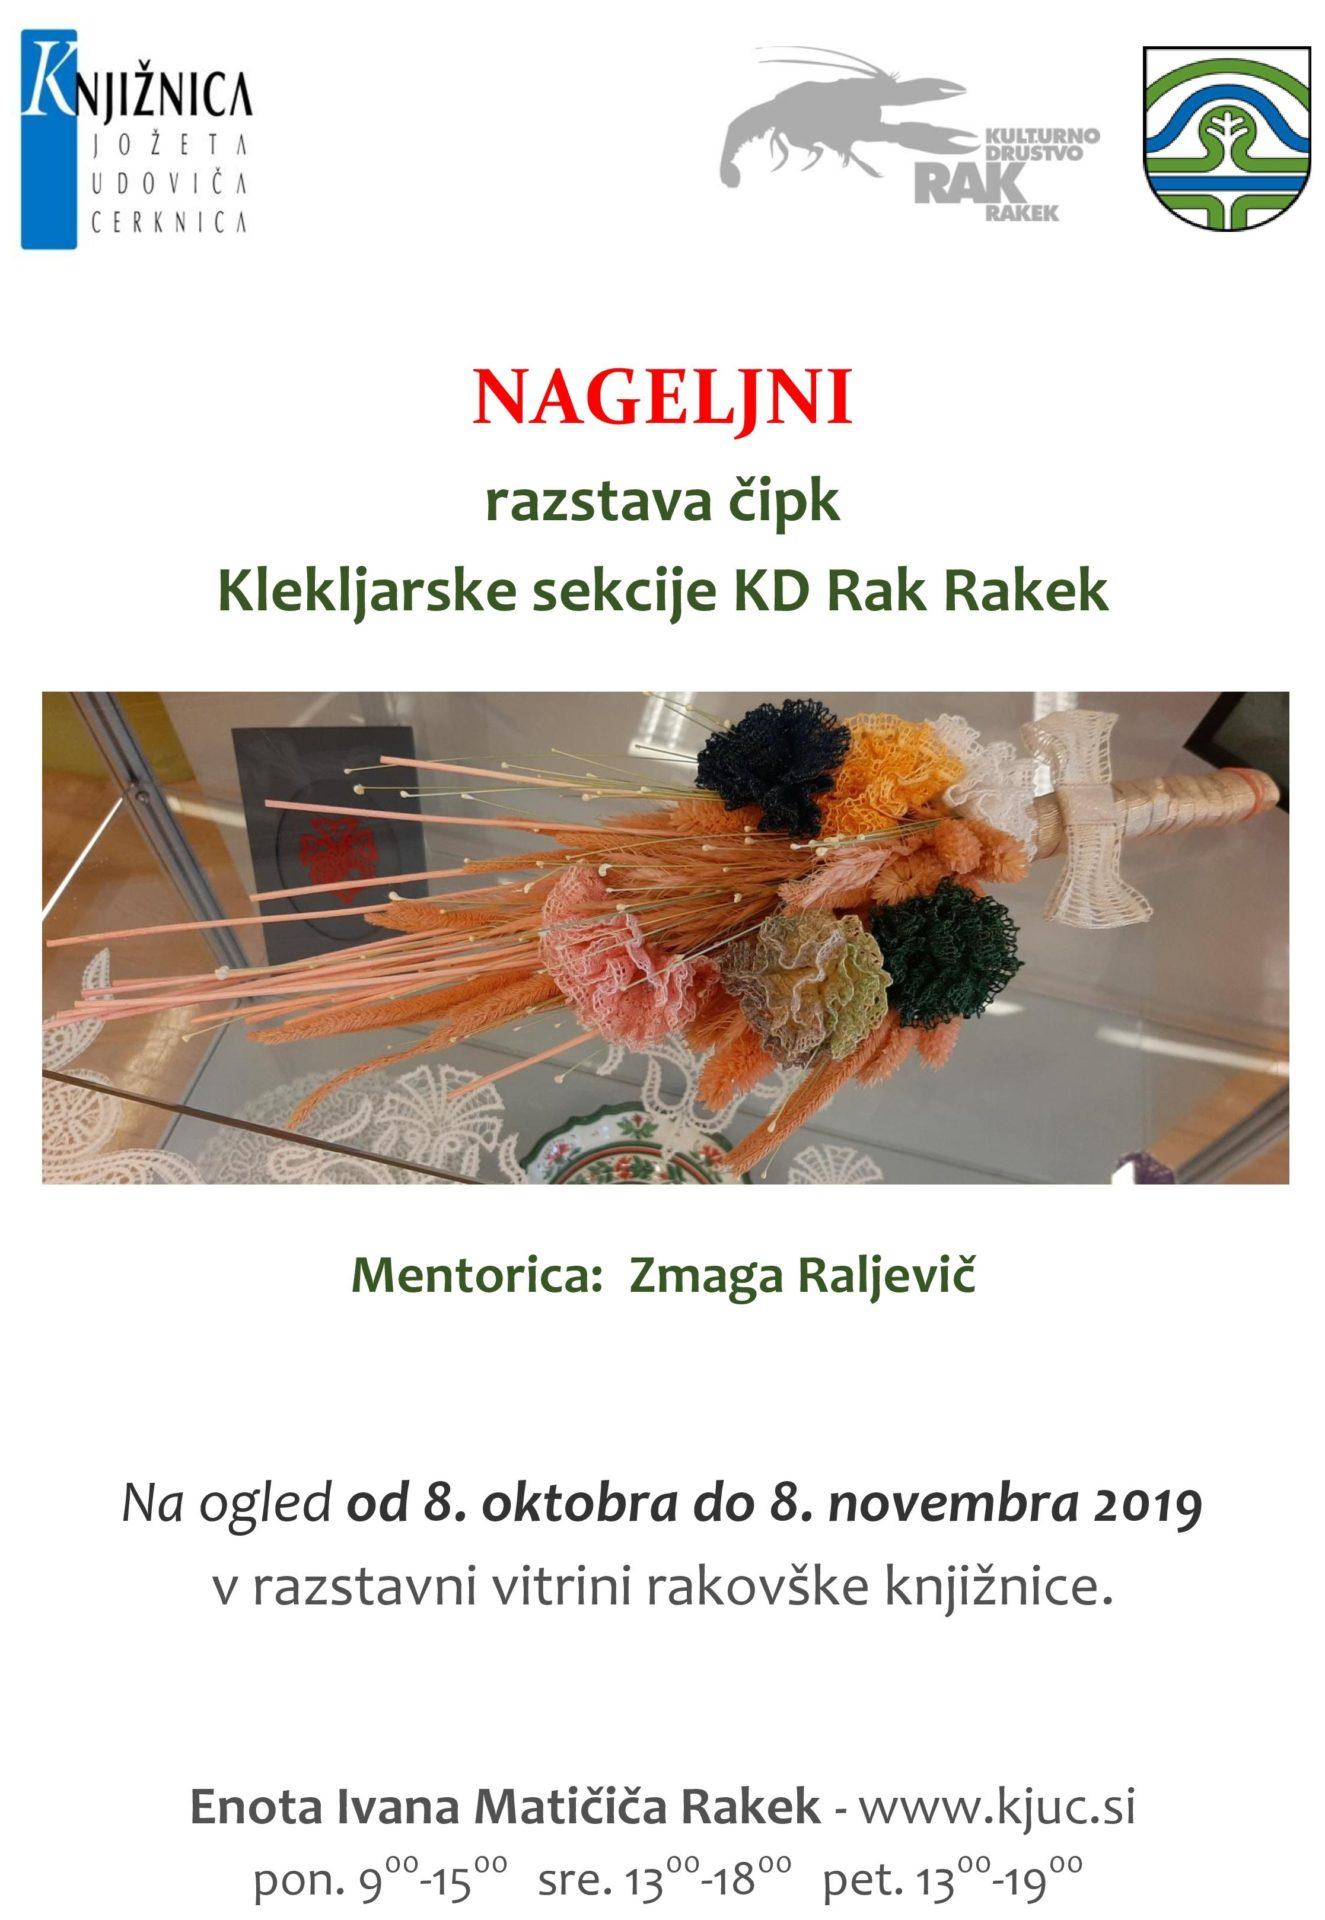 cover 2 - Nageljni - razstava čipk Klekljarske sekcije KD Rak Rakek